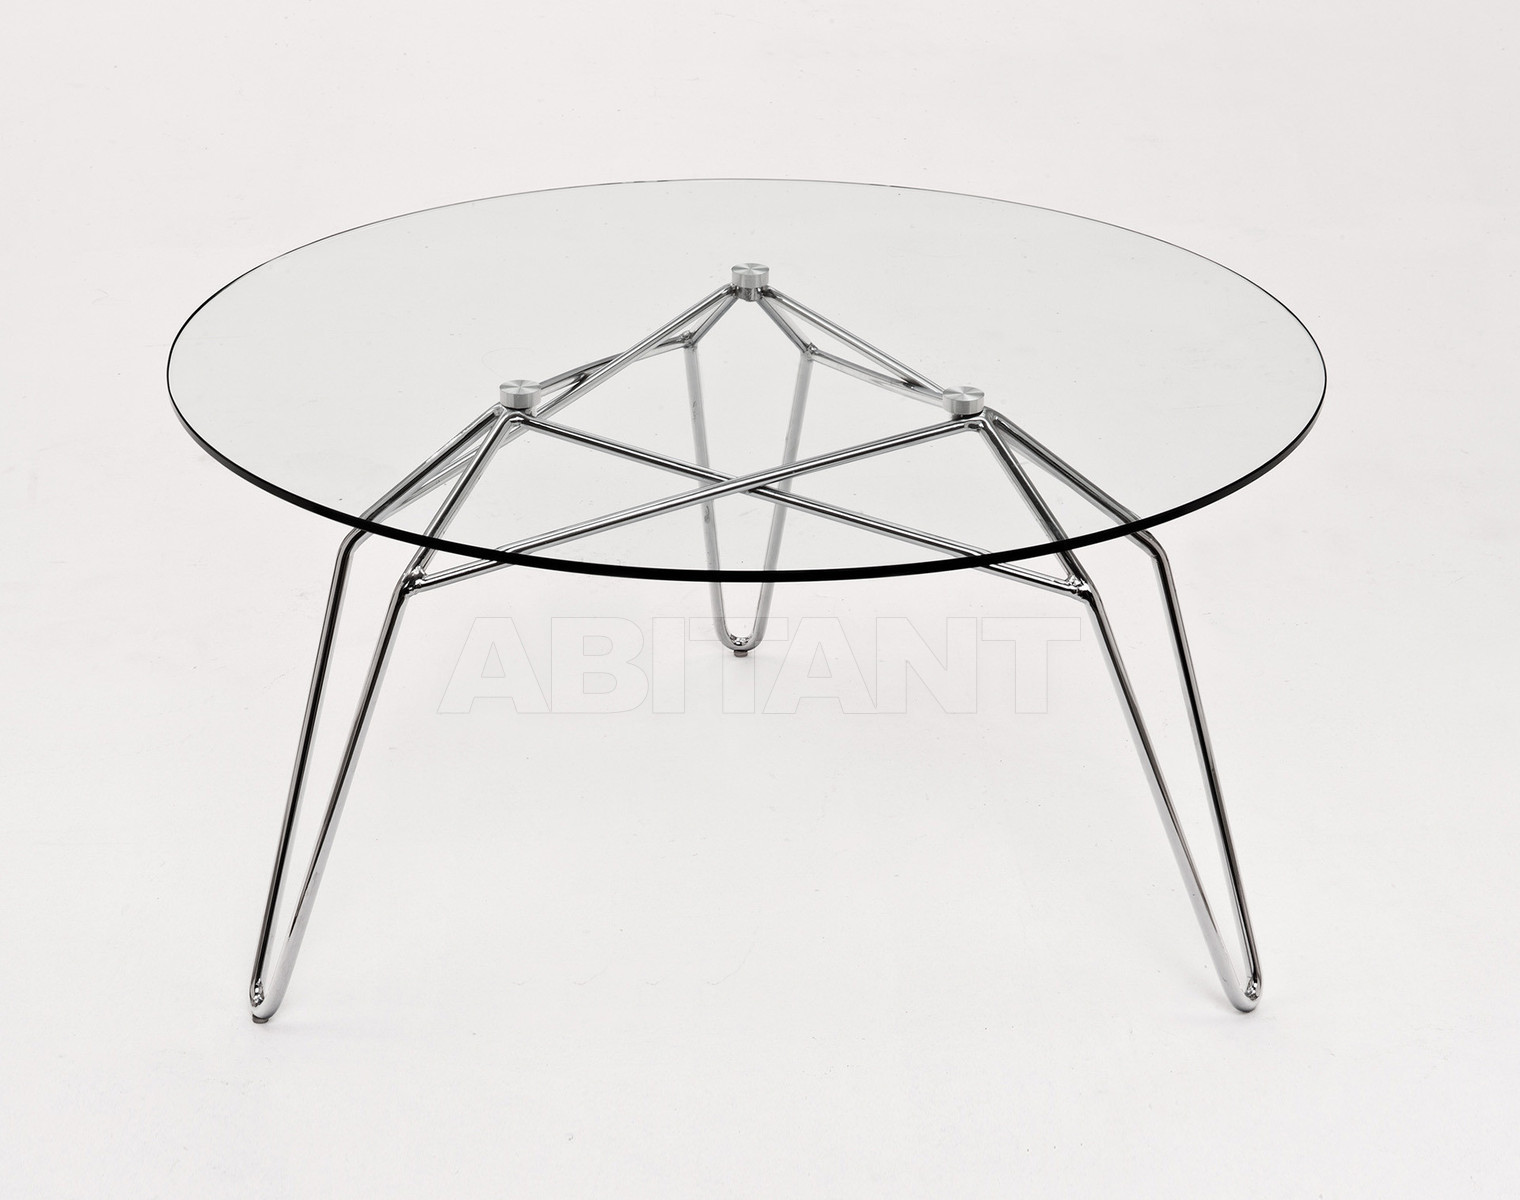 Купить Столик кофейный Kubikoff Stolt Design Diamond'Coffee'Table'